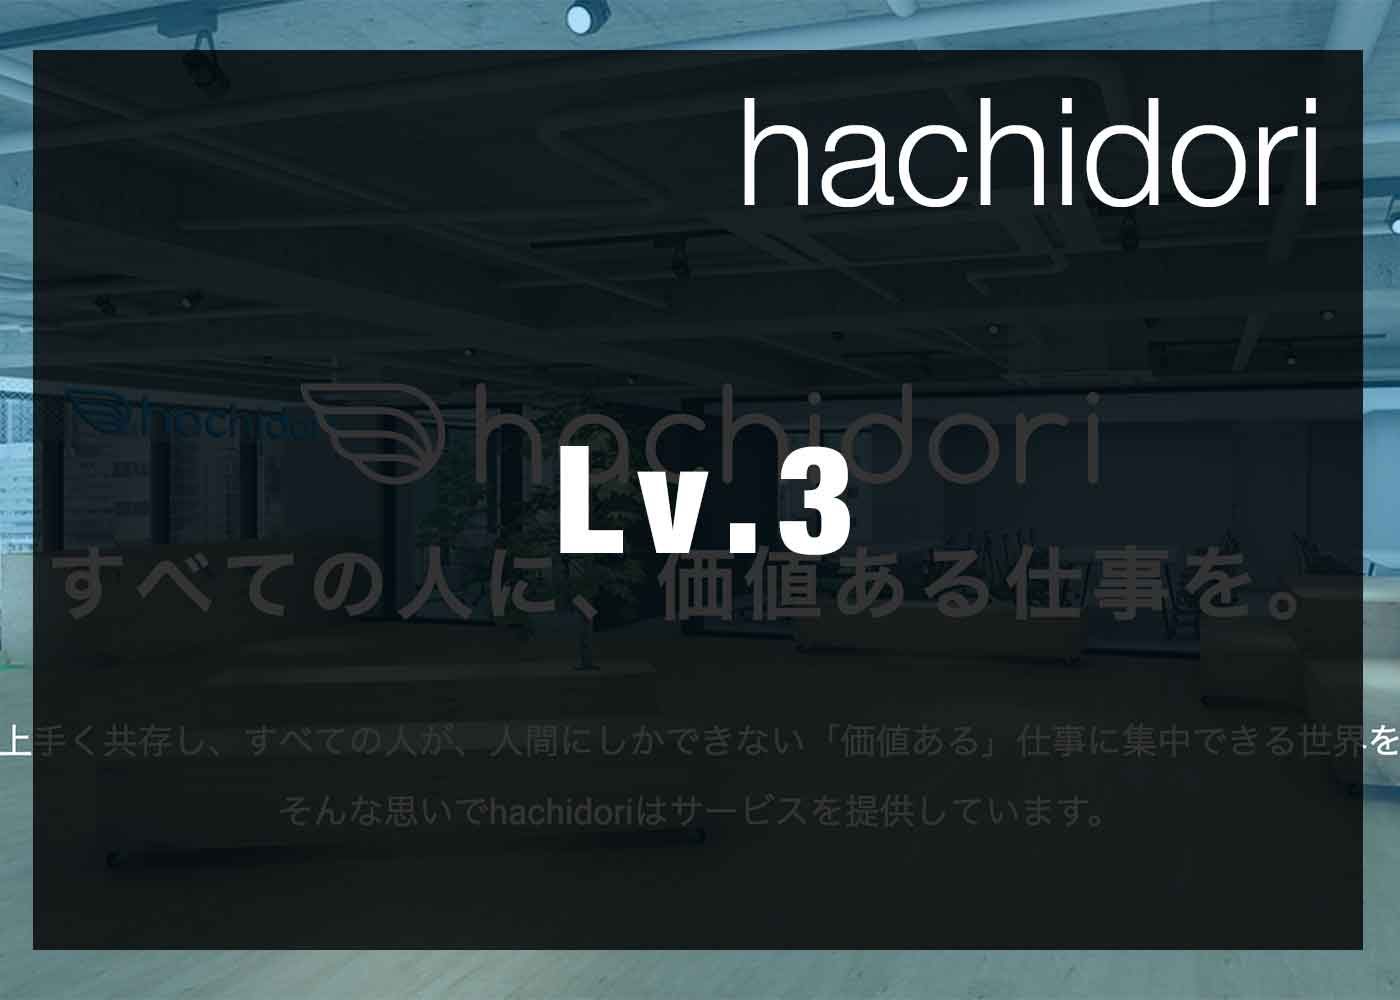 Lv.3: hachidoriの「シナリオ分岐」の使い方